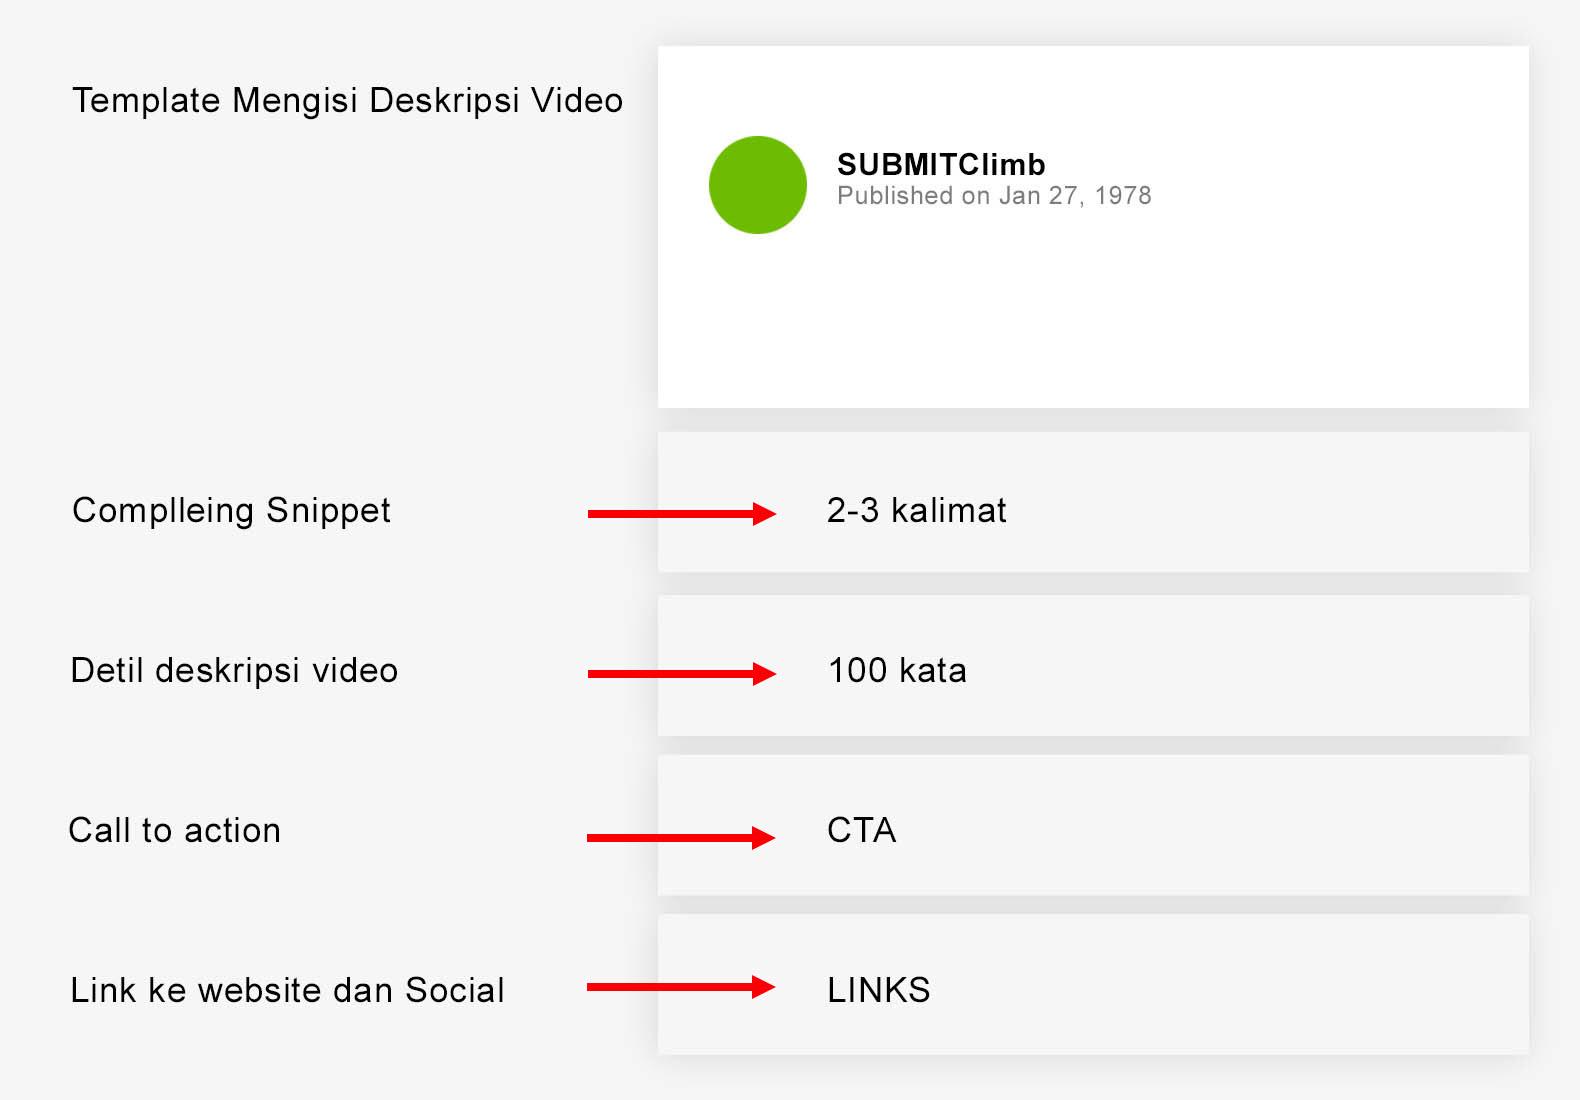 Template deskripsi video